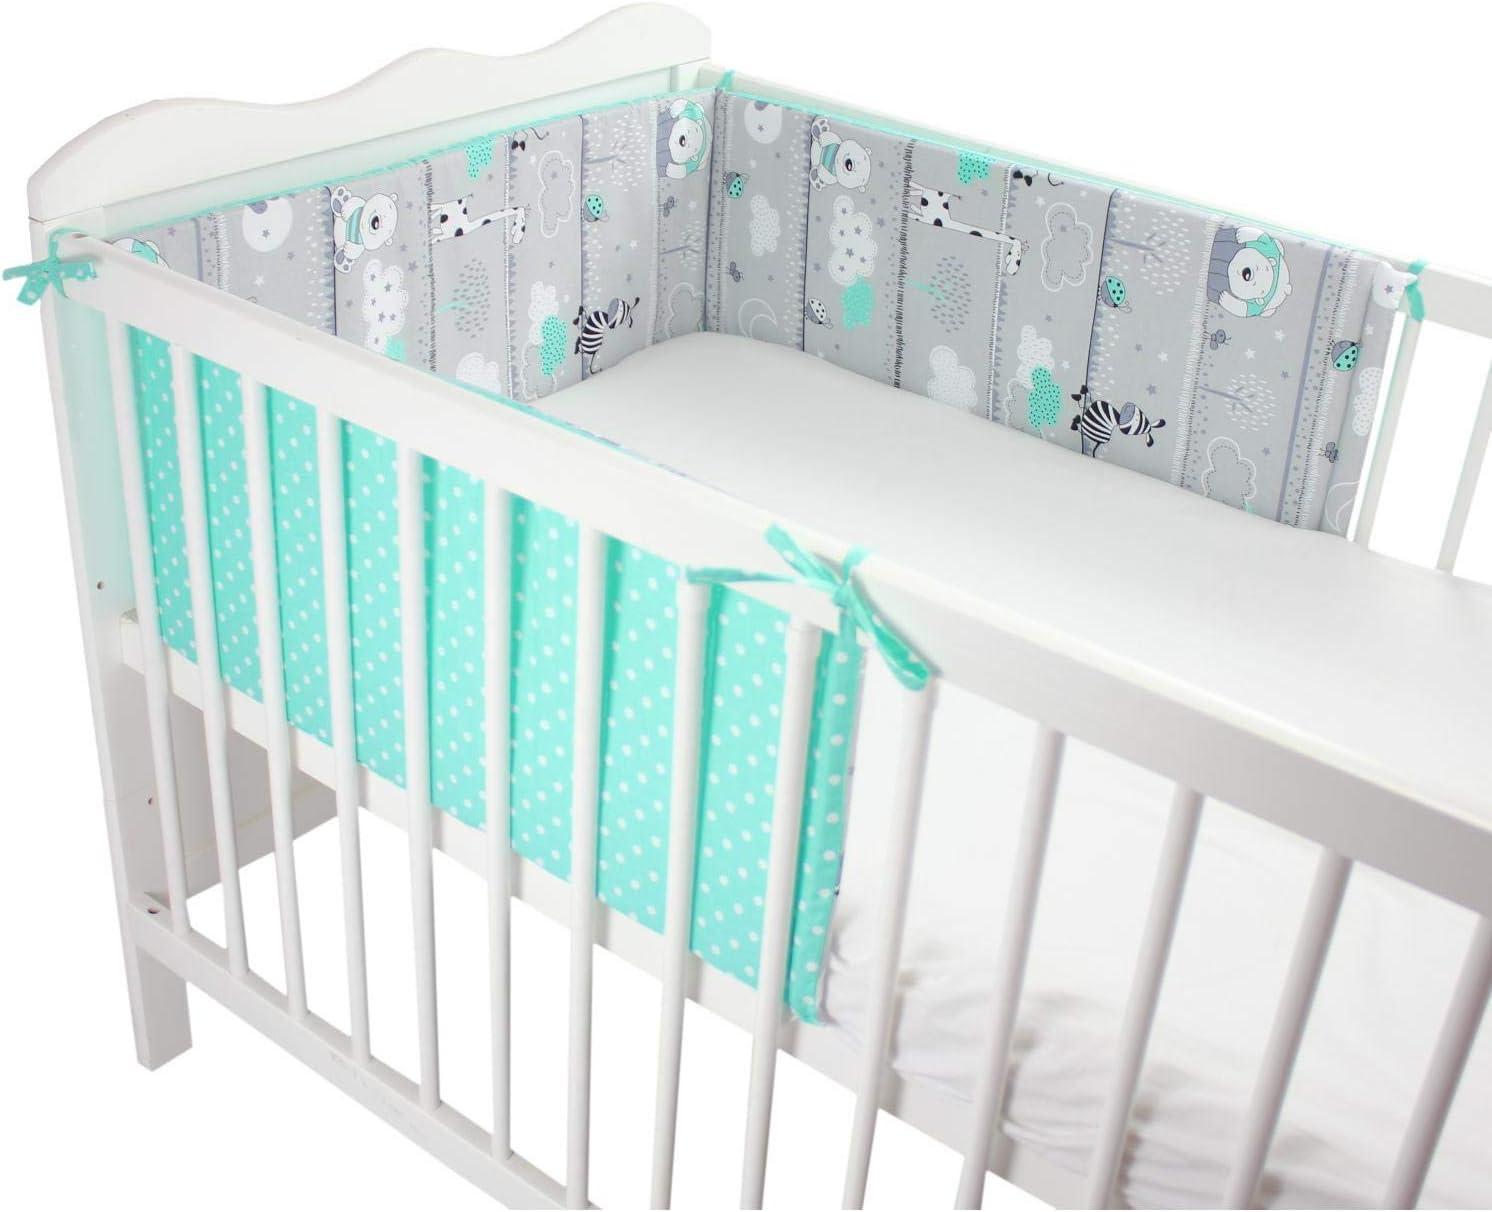 Gr/ö/ße: 180x30cm TupTam Babybett Kopfumrandung Nestchen Kurz Gemustert f/ür Babybett 120x60 Farbe: Flamingo Mint